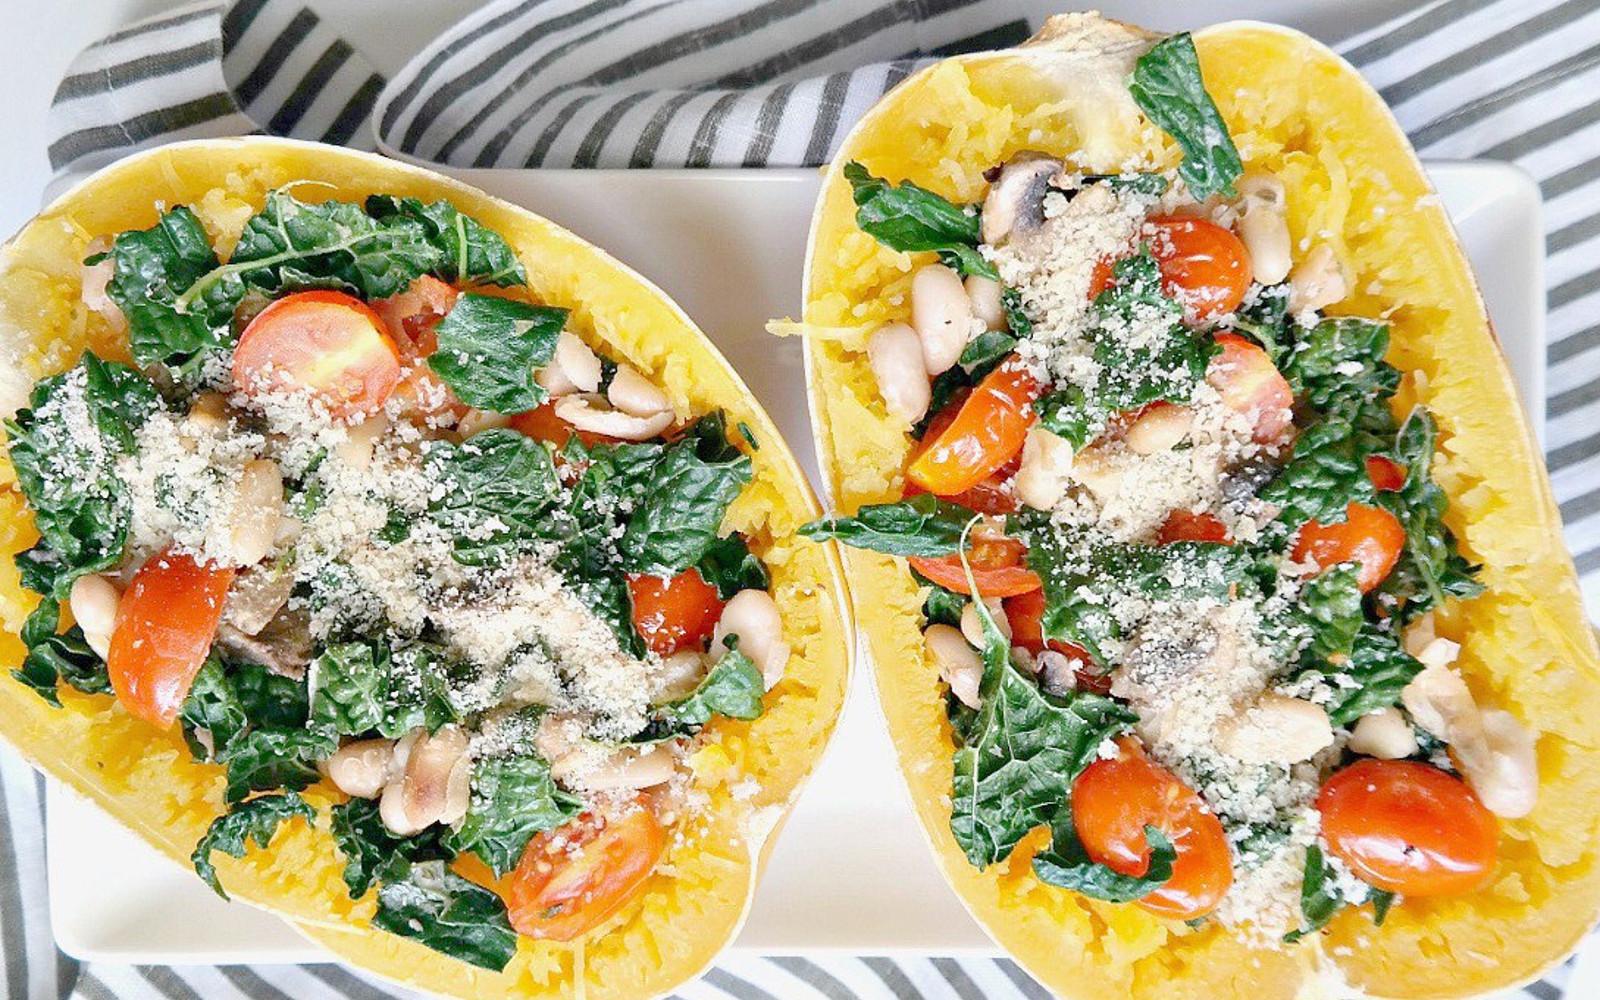 tuscan kale and mushroom stuffed spaghetti squash